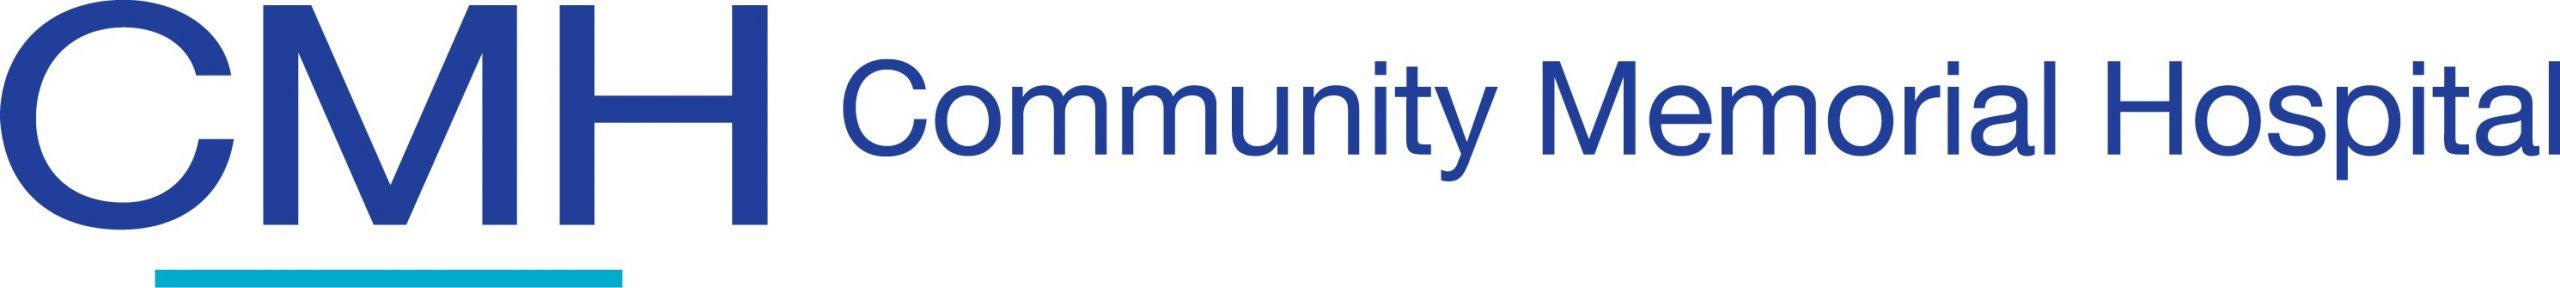 CMH logo.